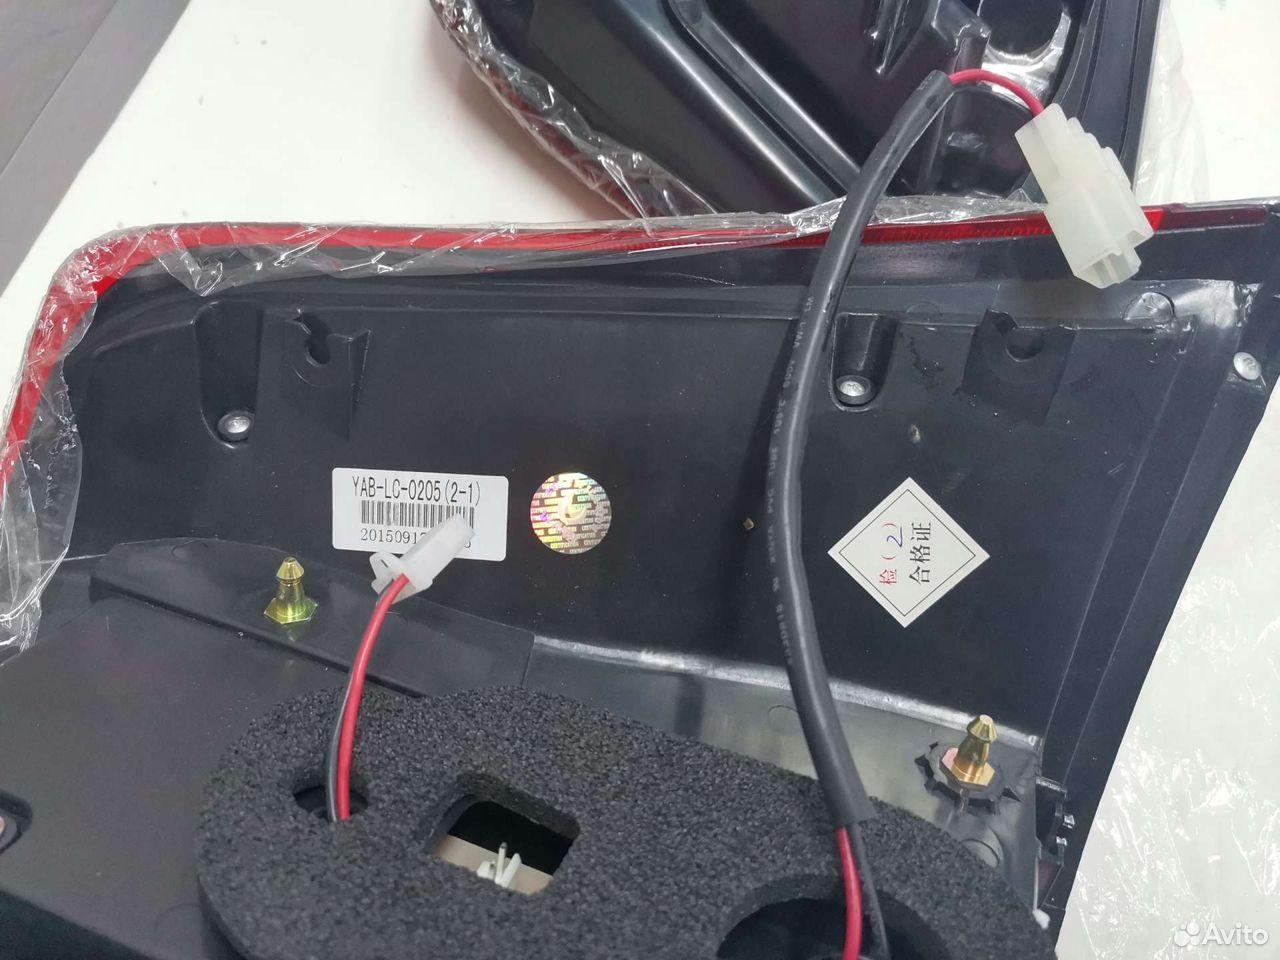 Задние фонари Lexus lx 570, tlc 200 с 2008 по 2012  89246877333 купить 6